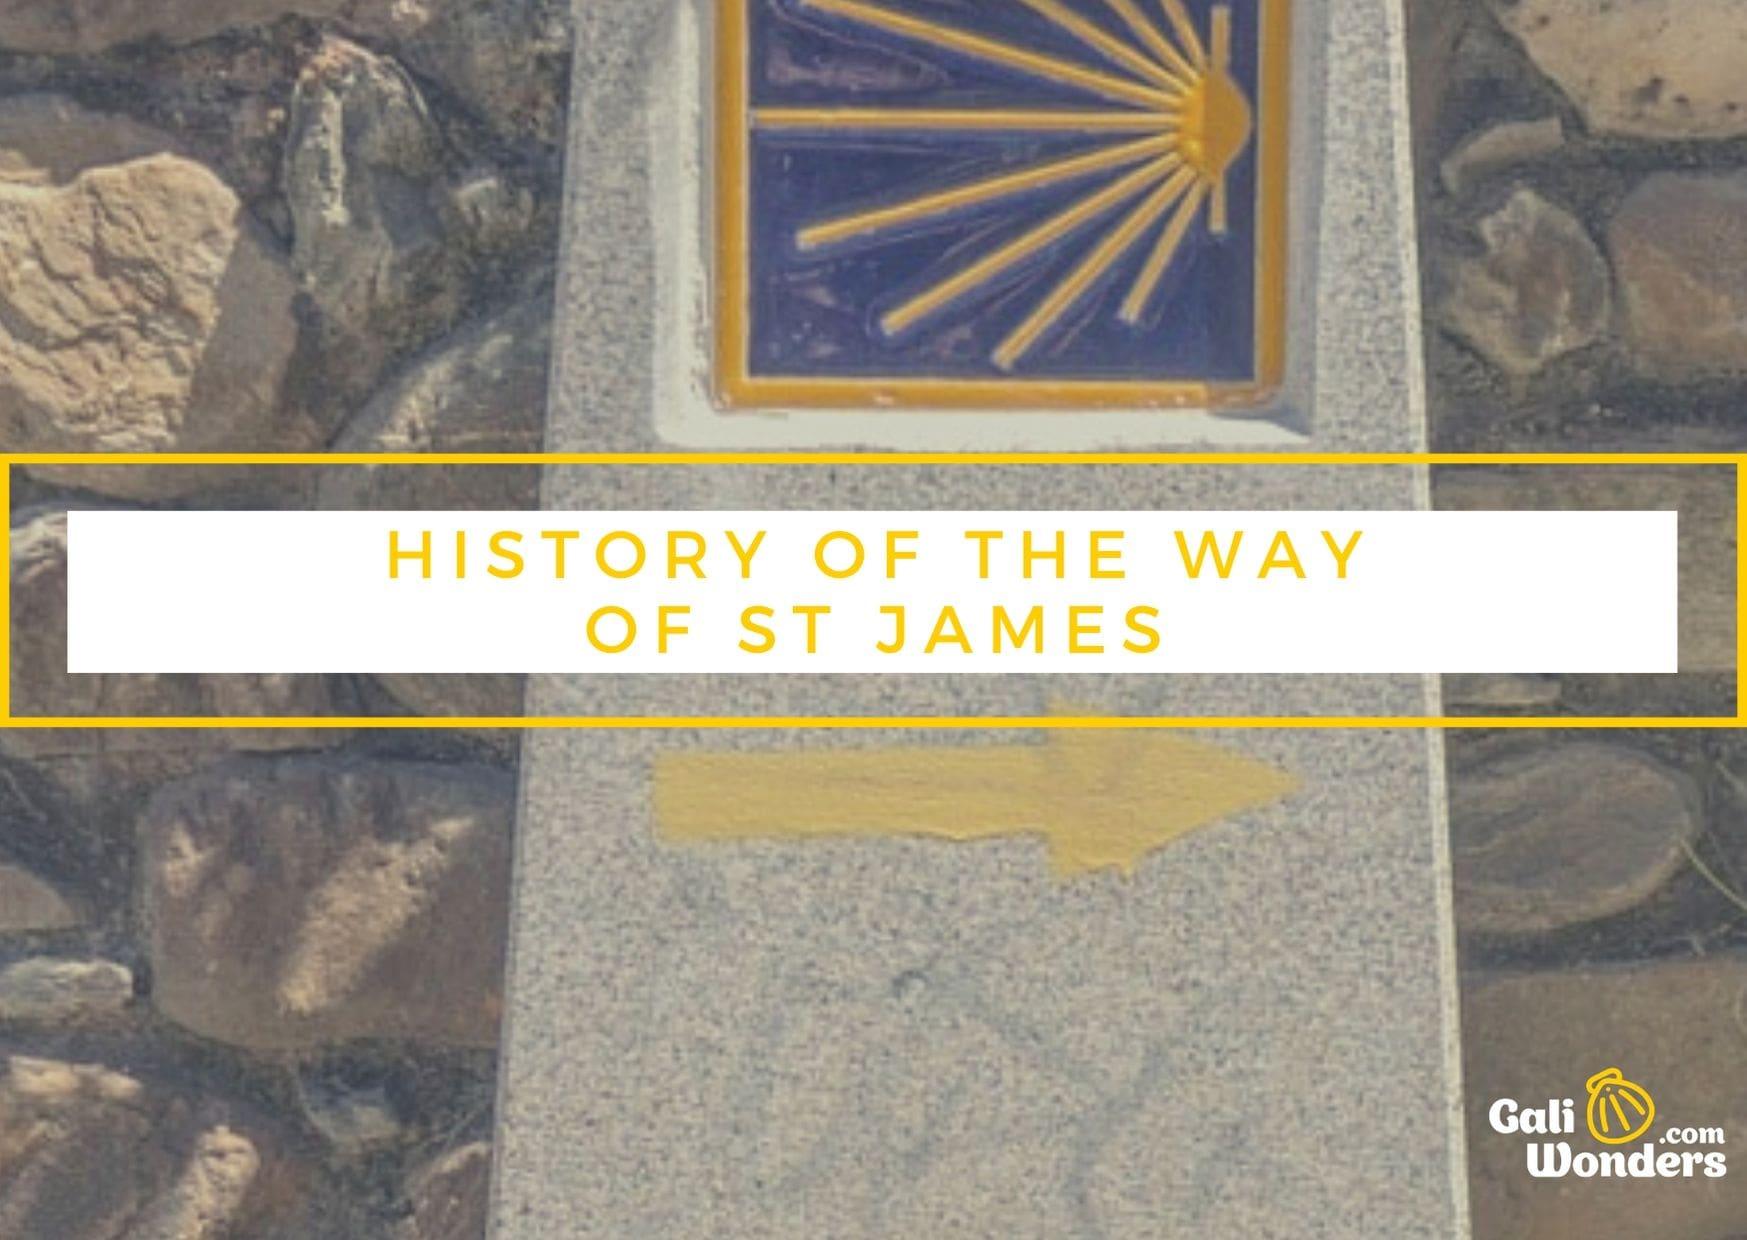 Way of Saint James History Galiwonders